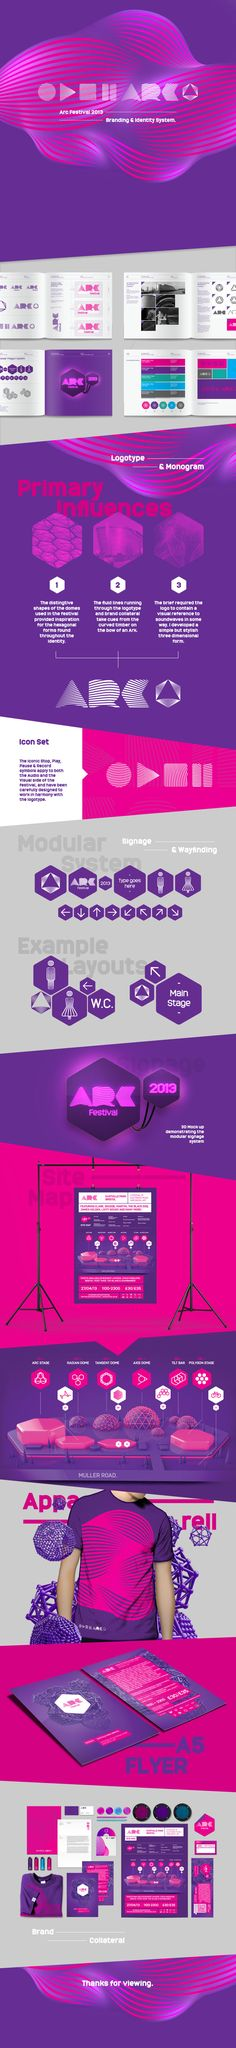 Graphic design layout. Inspirational graphic design & marketing material sample.  Visit us at: www.sodapopmedia.com #GraphicDesign #PrintDesign #MarketingMaterialDesign #MarketingMaterials #PackagingDesign